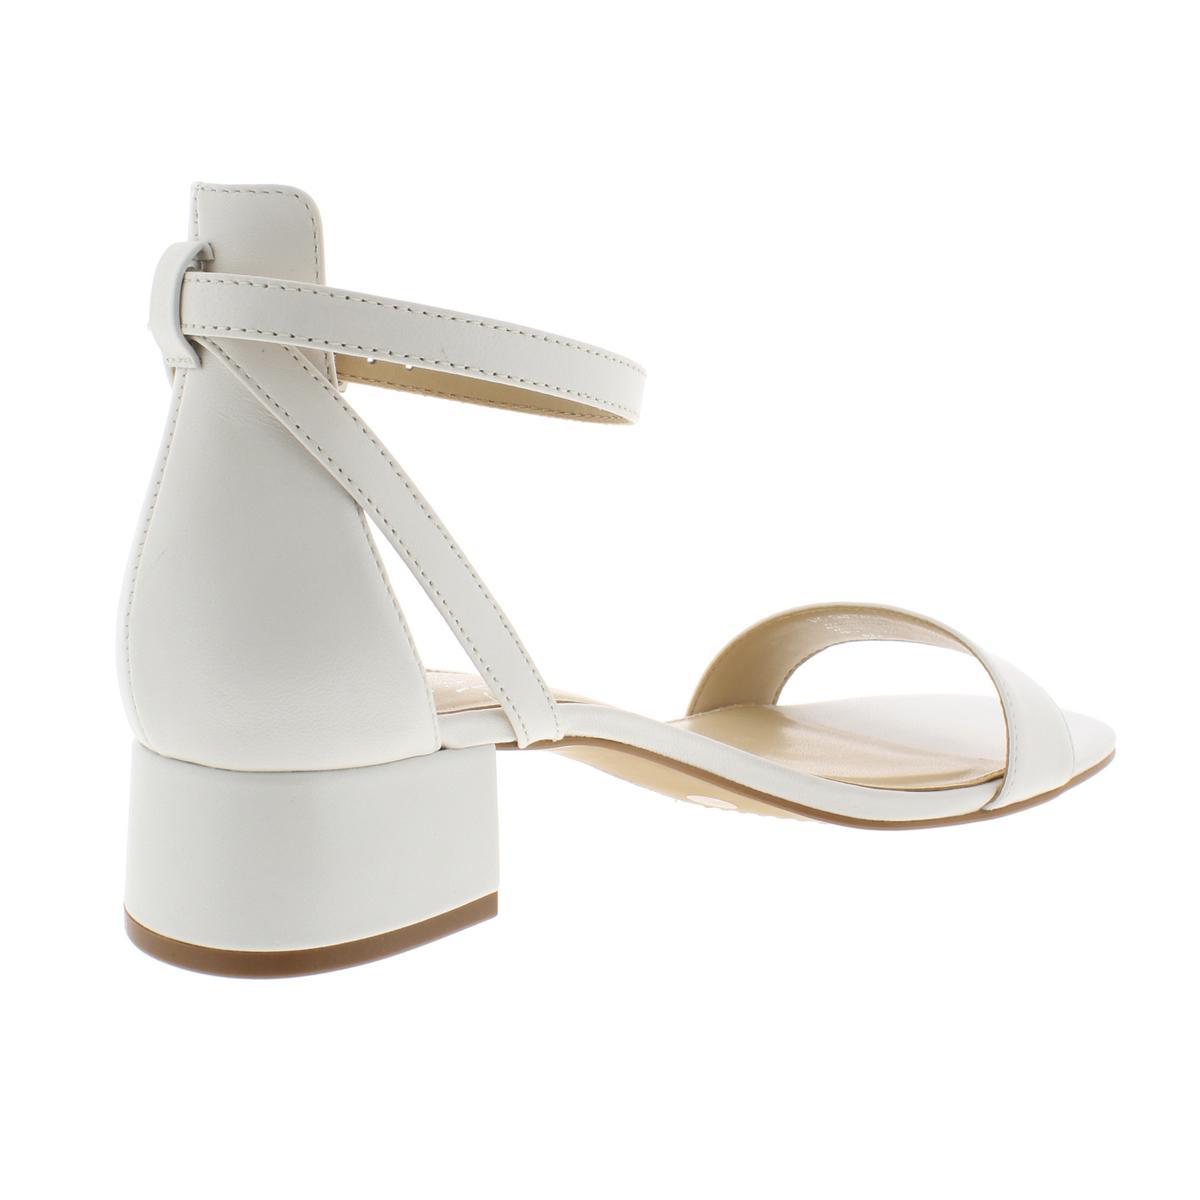 Vince-Camuto-Womens-Shetana-Block-Heel-Ankle-Strap-Dress-Sandals-Shoes-BHFO-7981 thumbnail 4